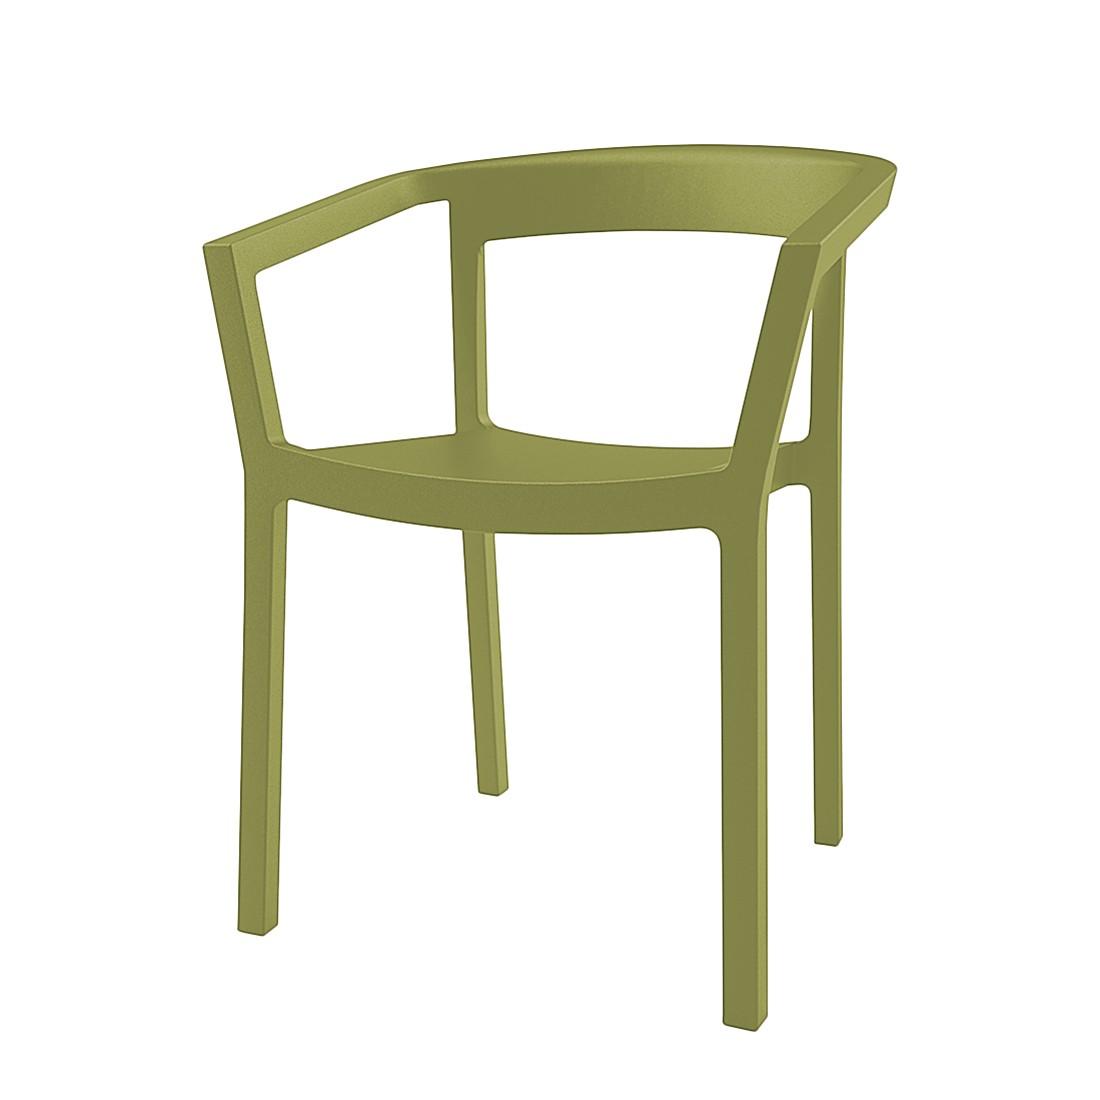 Armlehnenstuhl Peach (2er Set) Kunststoff – Olivgrün, Blanke Design online bestellen